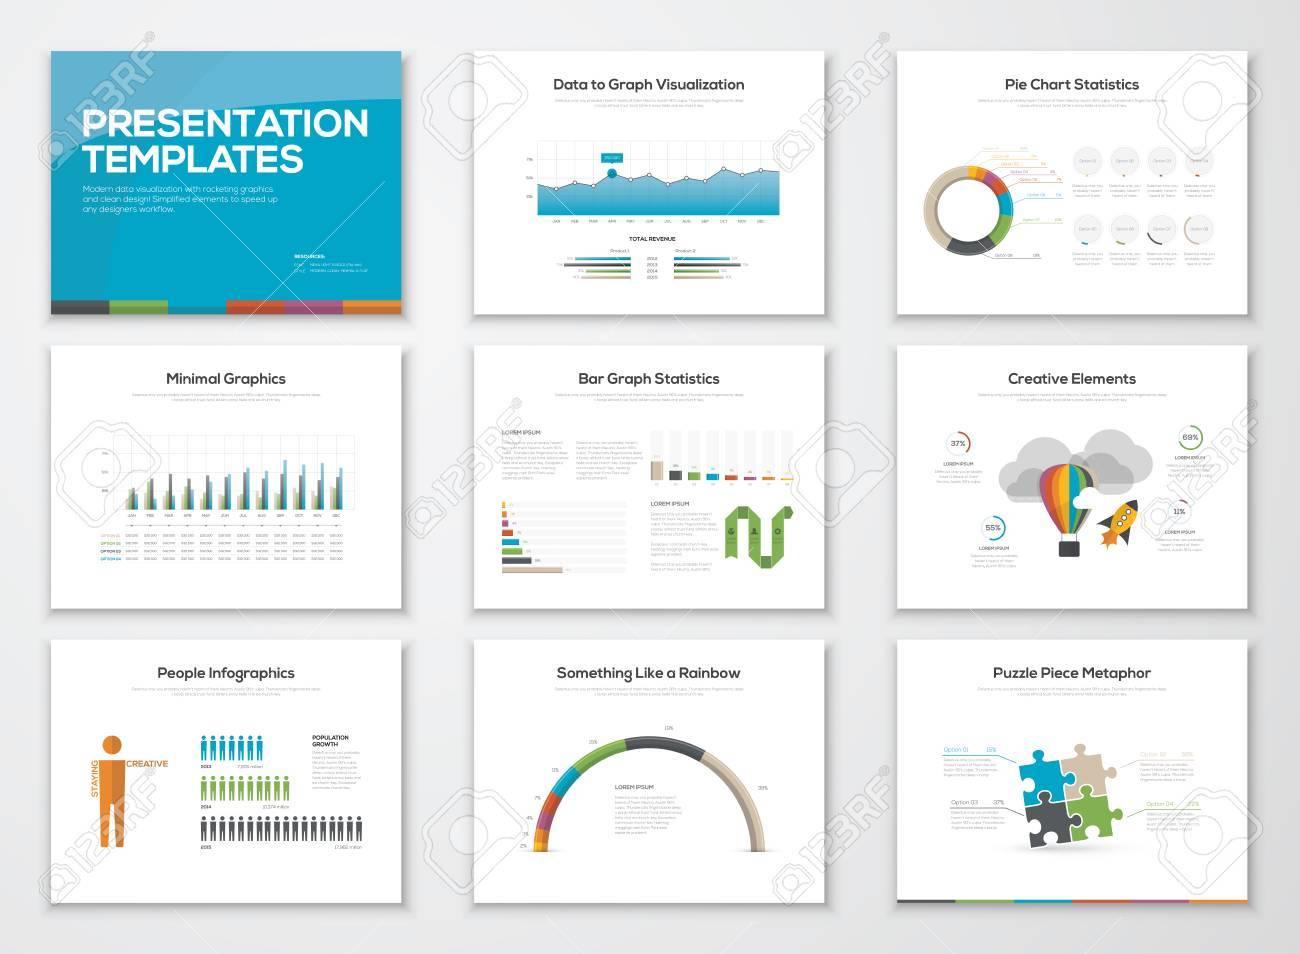 Presentation Slide Templates And Business Vector Brochures Royalty ...